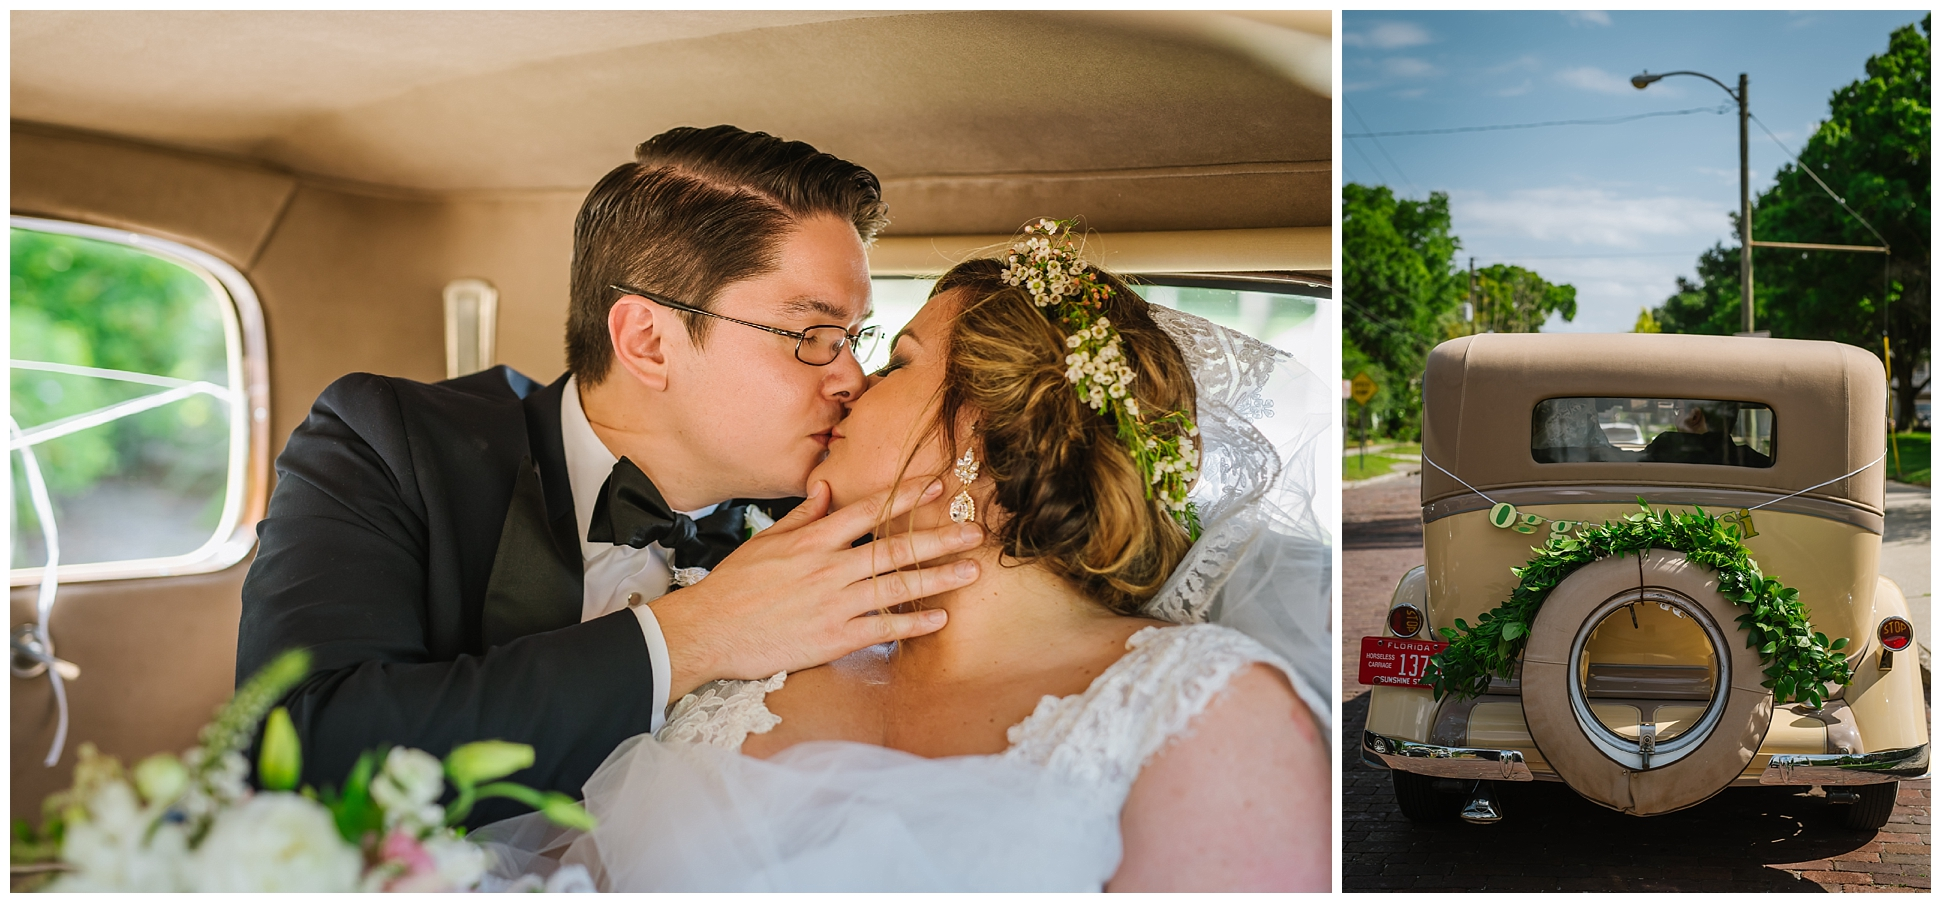 st-pete-wedding-photographer-italian-romance-theme-rustic-flower-crown_0410.jpg